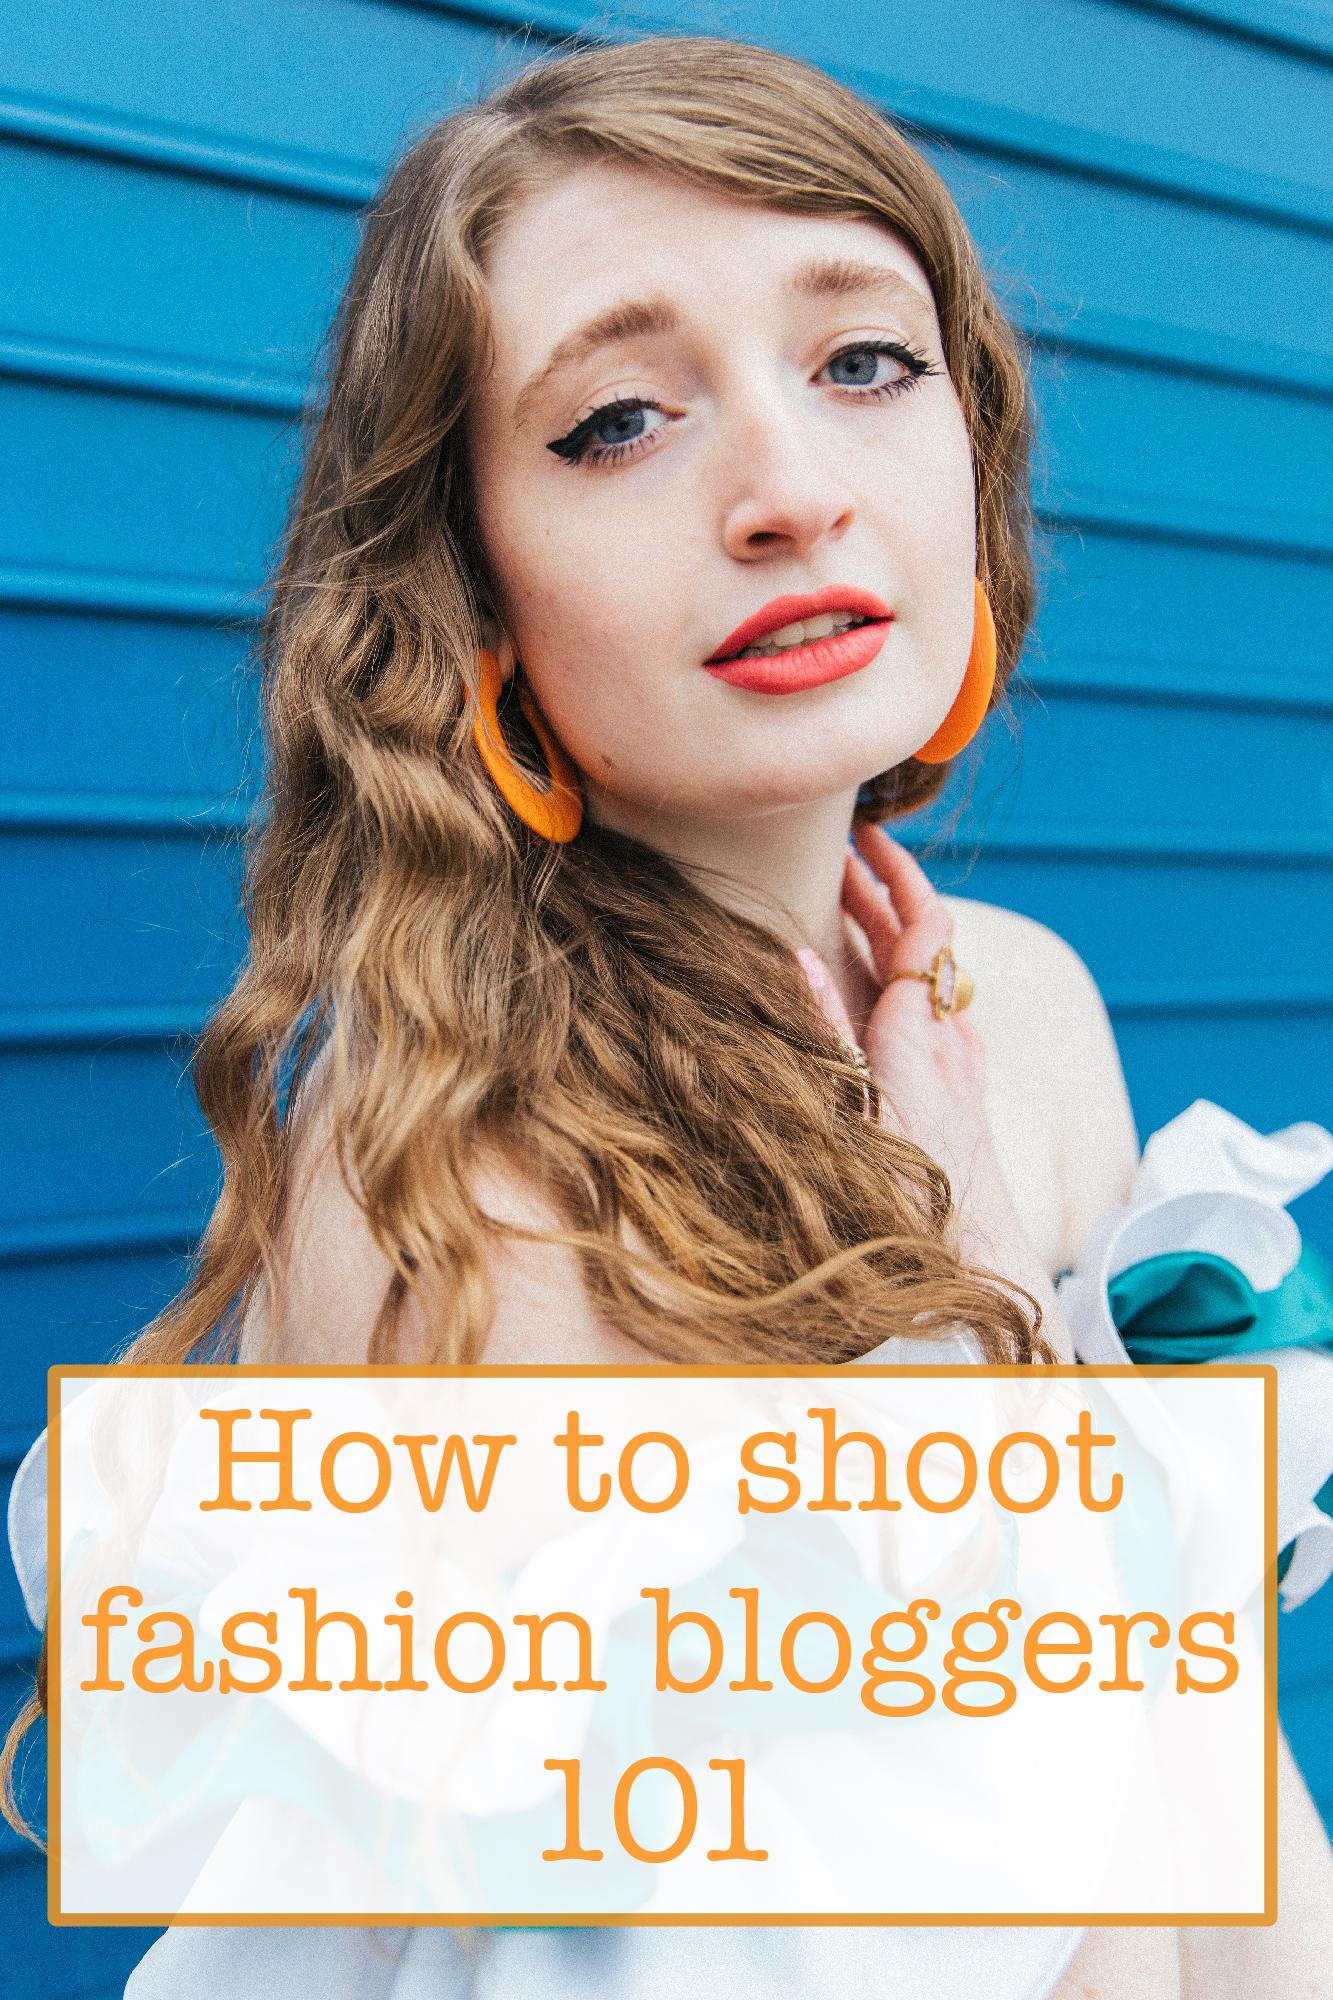 howtoshootbloggers2-01.jpg